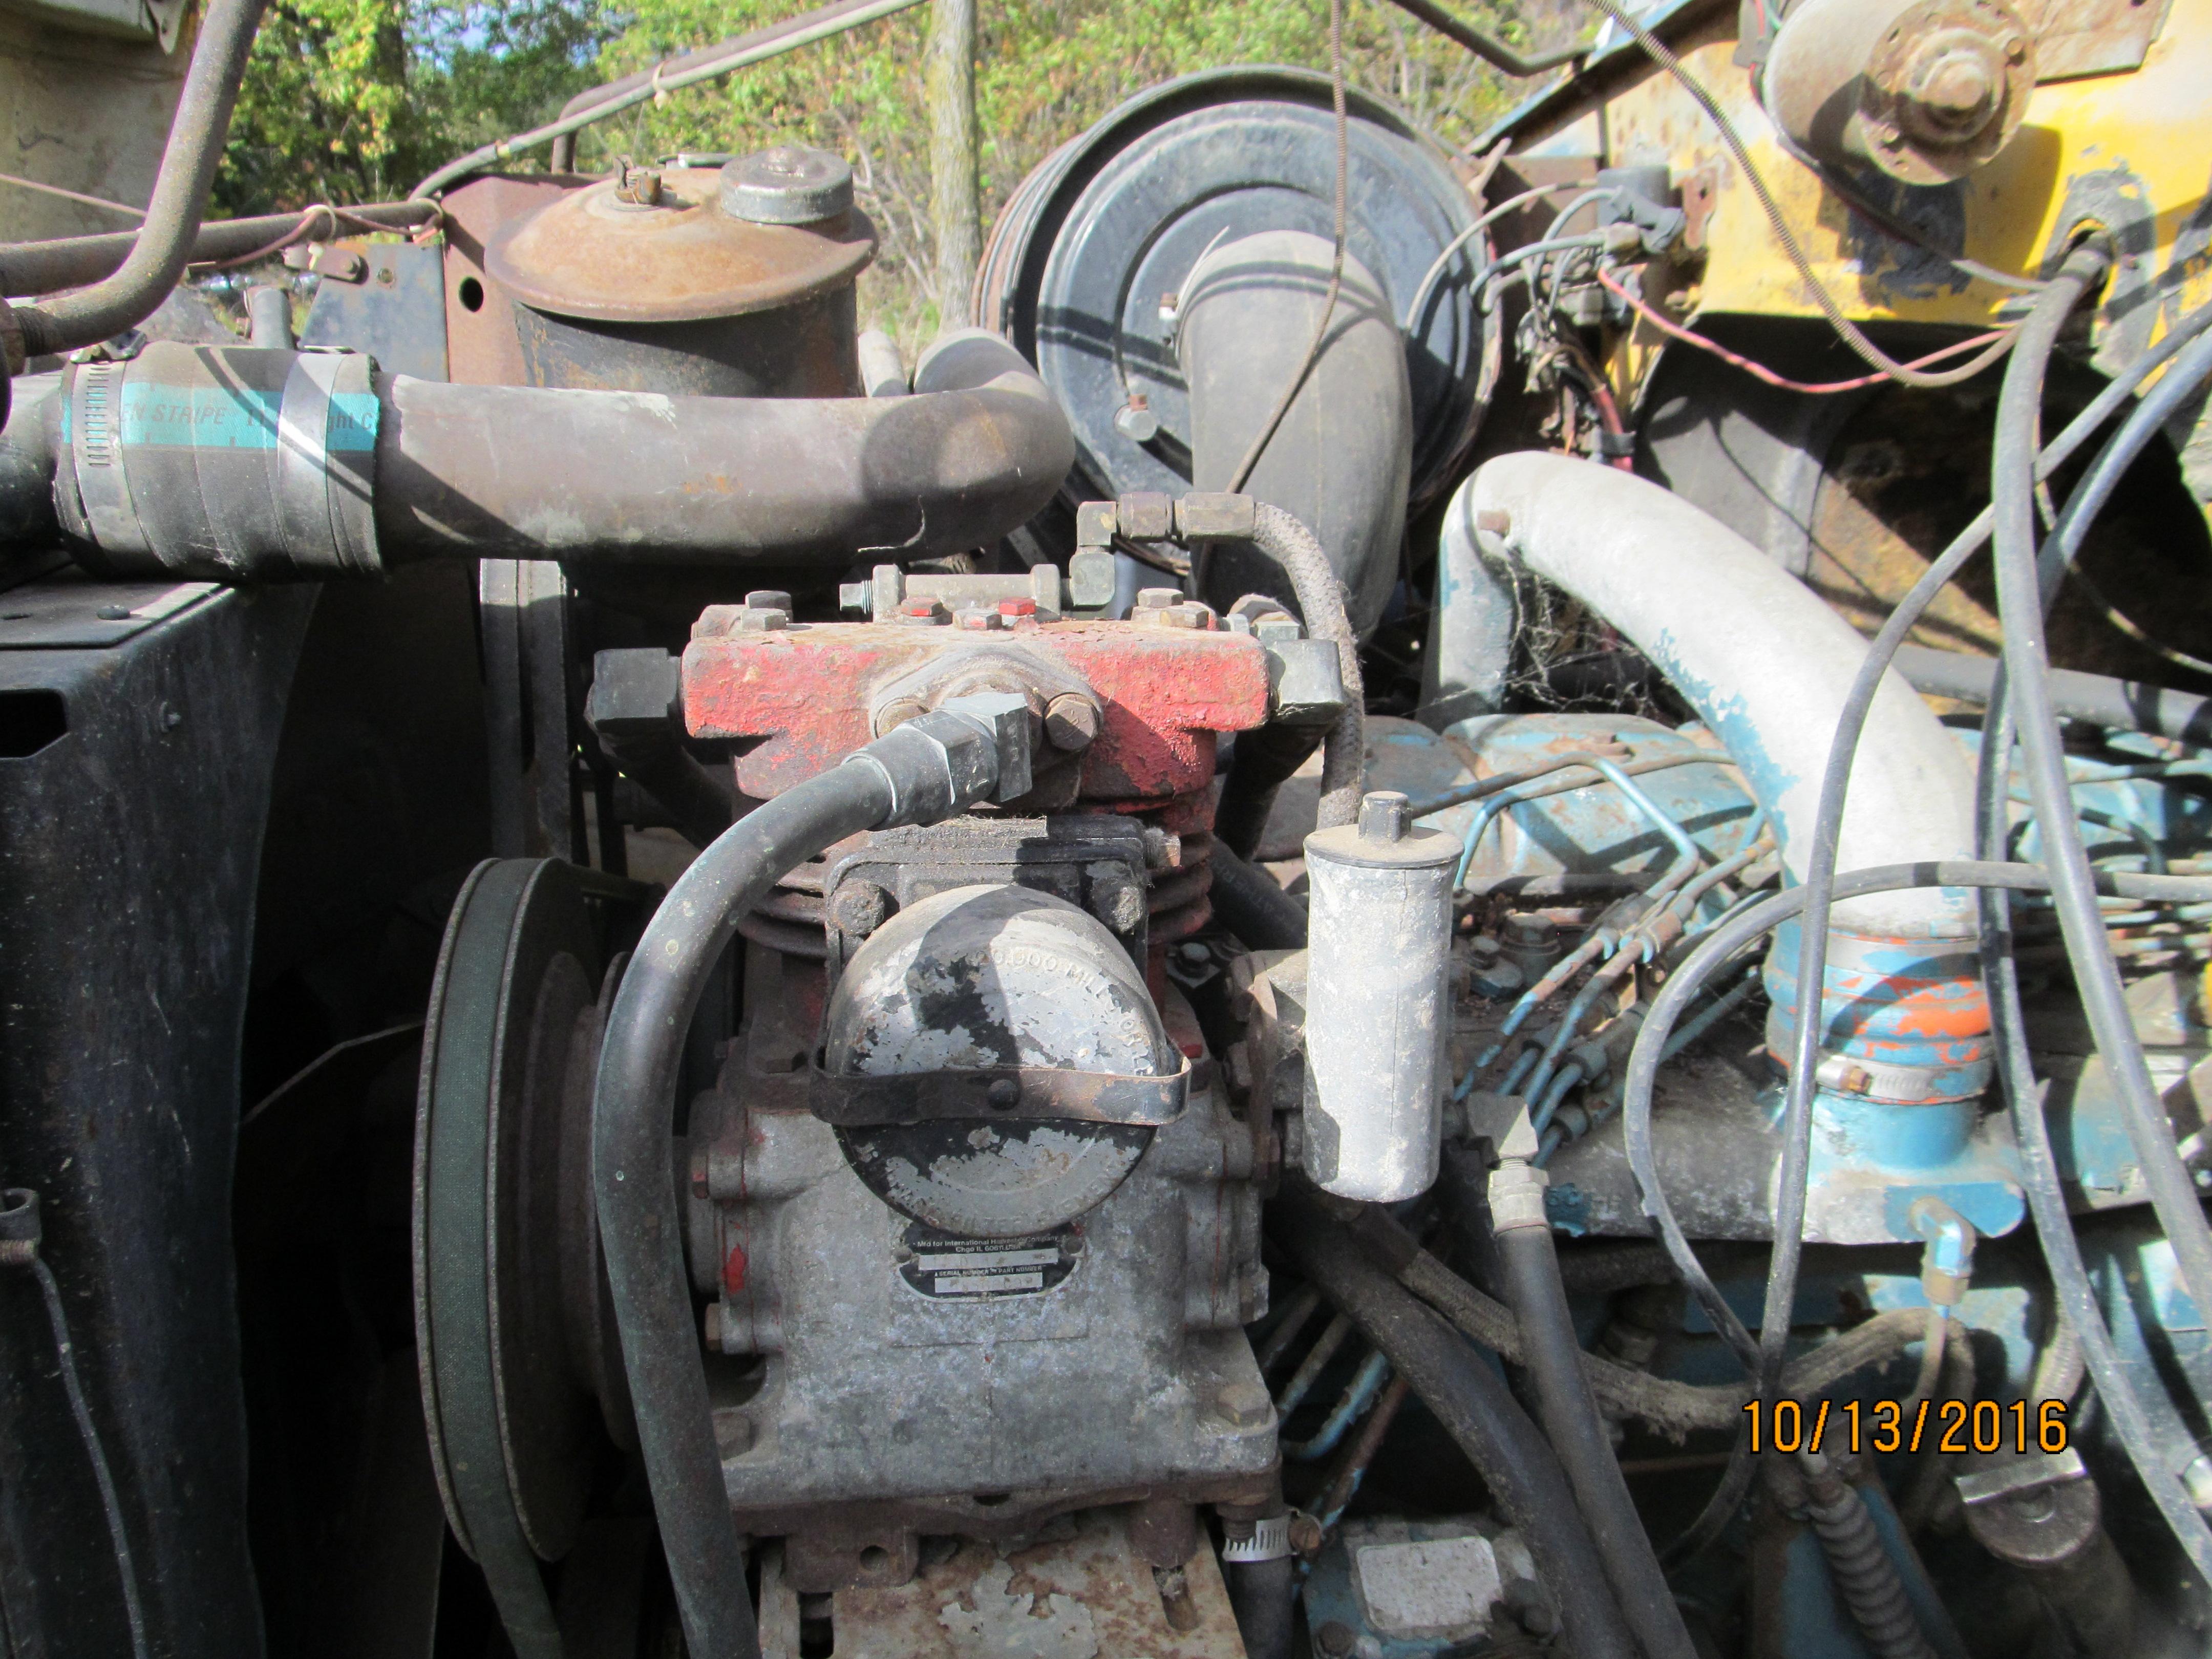 IH International 1750 loadstar dump truck for parts – Chesaning Auto